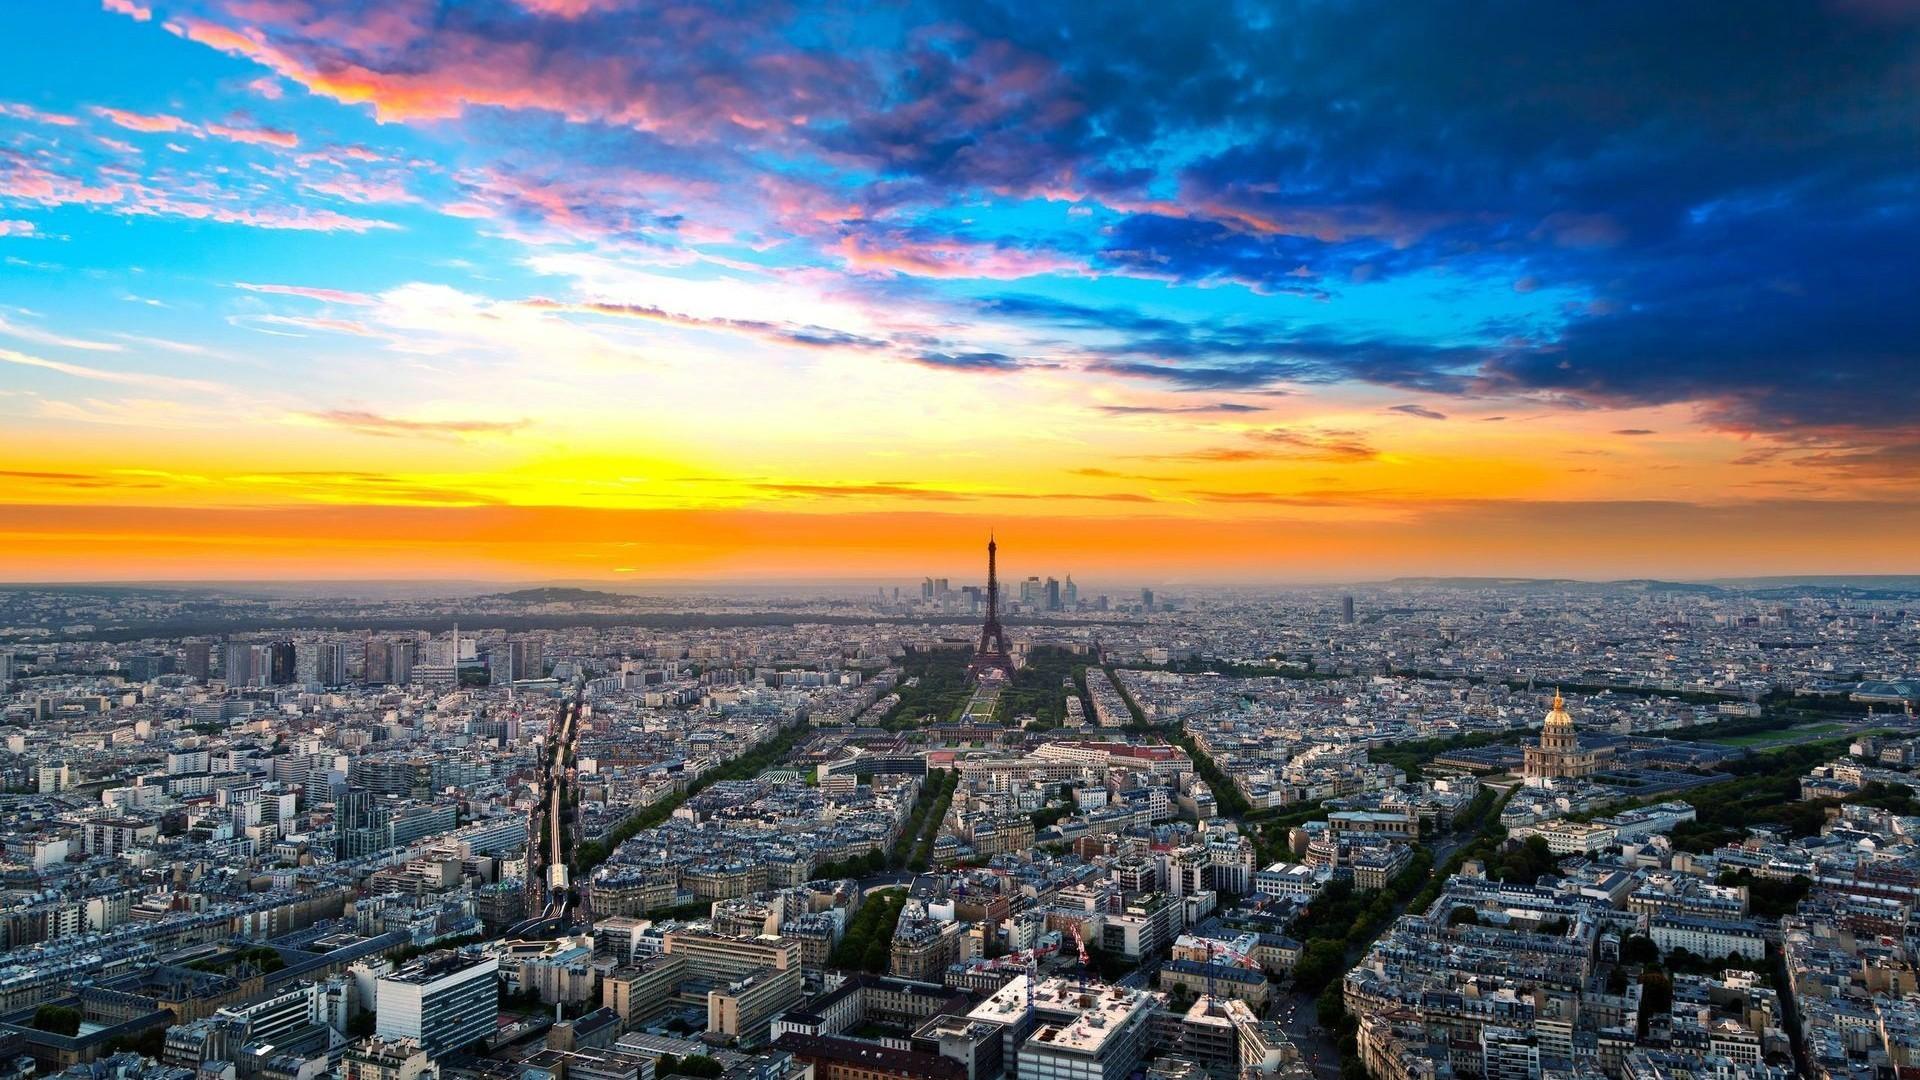 Sfondi Parigi 68 Immagini